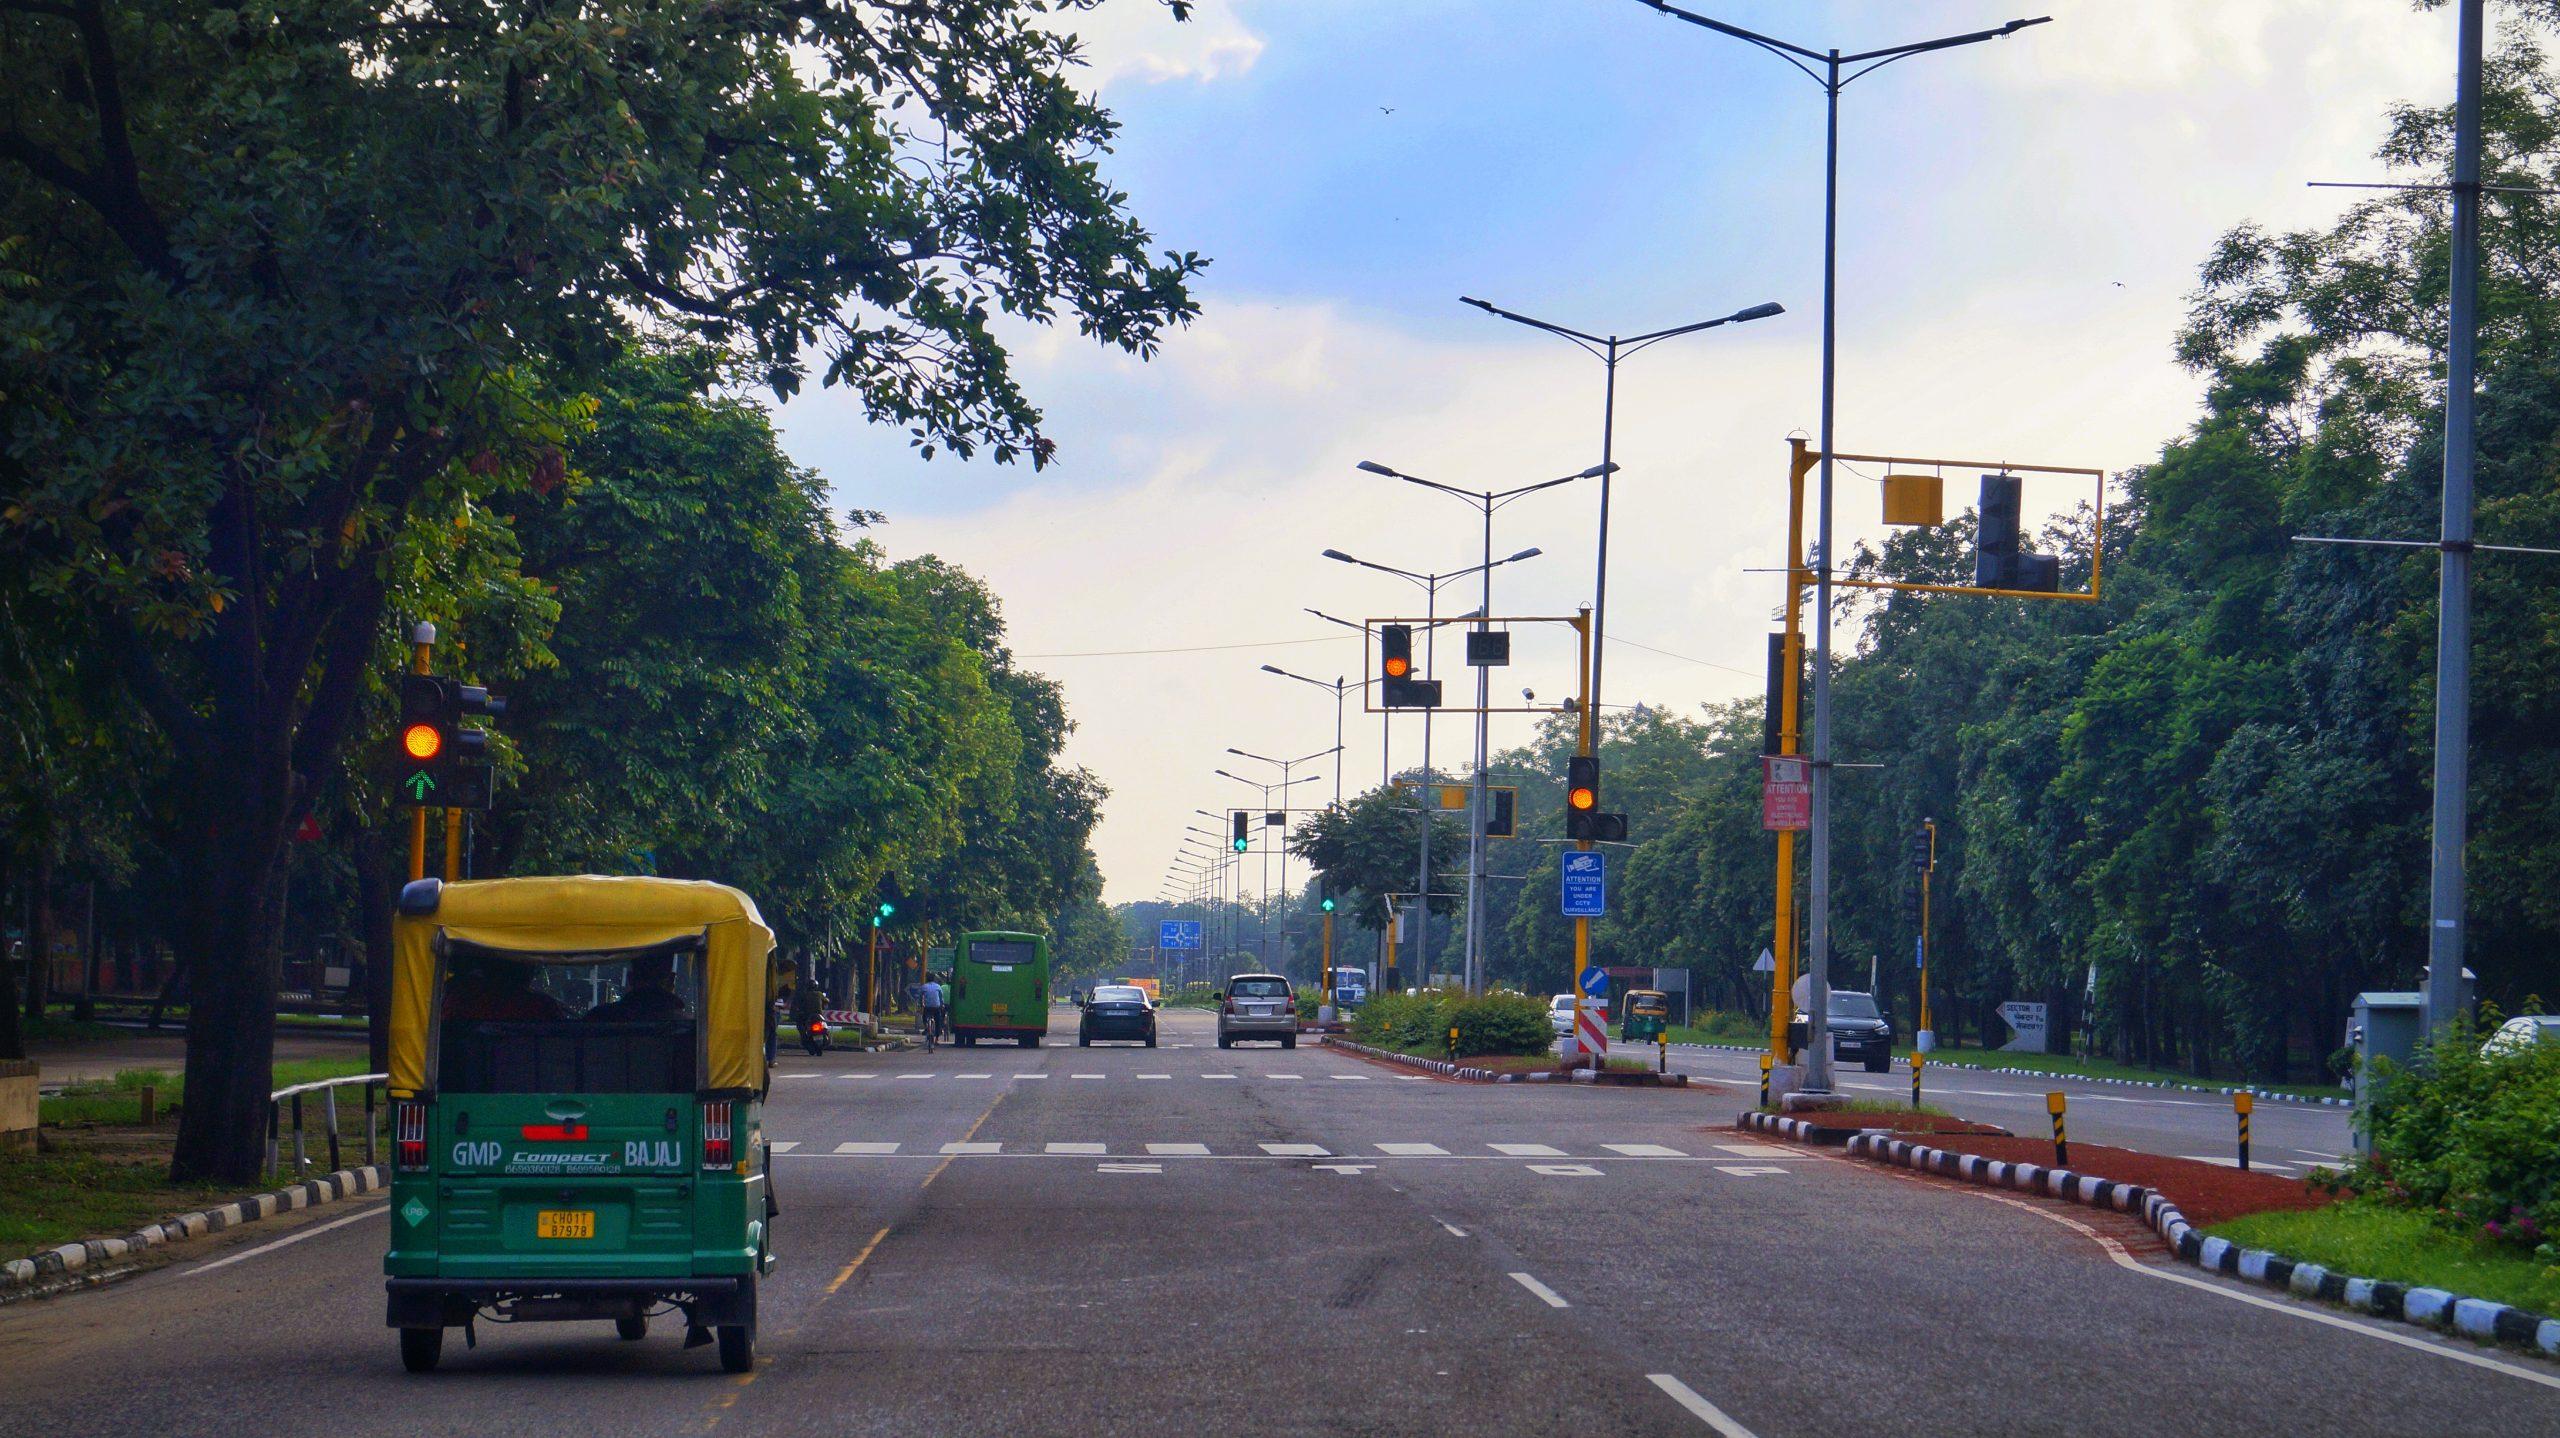 roadway in a city